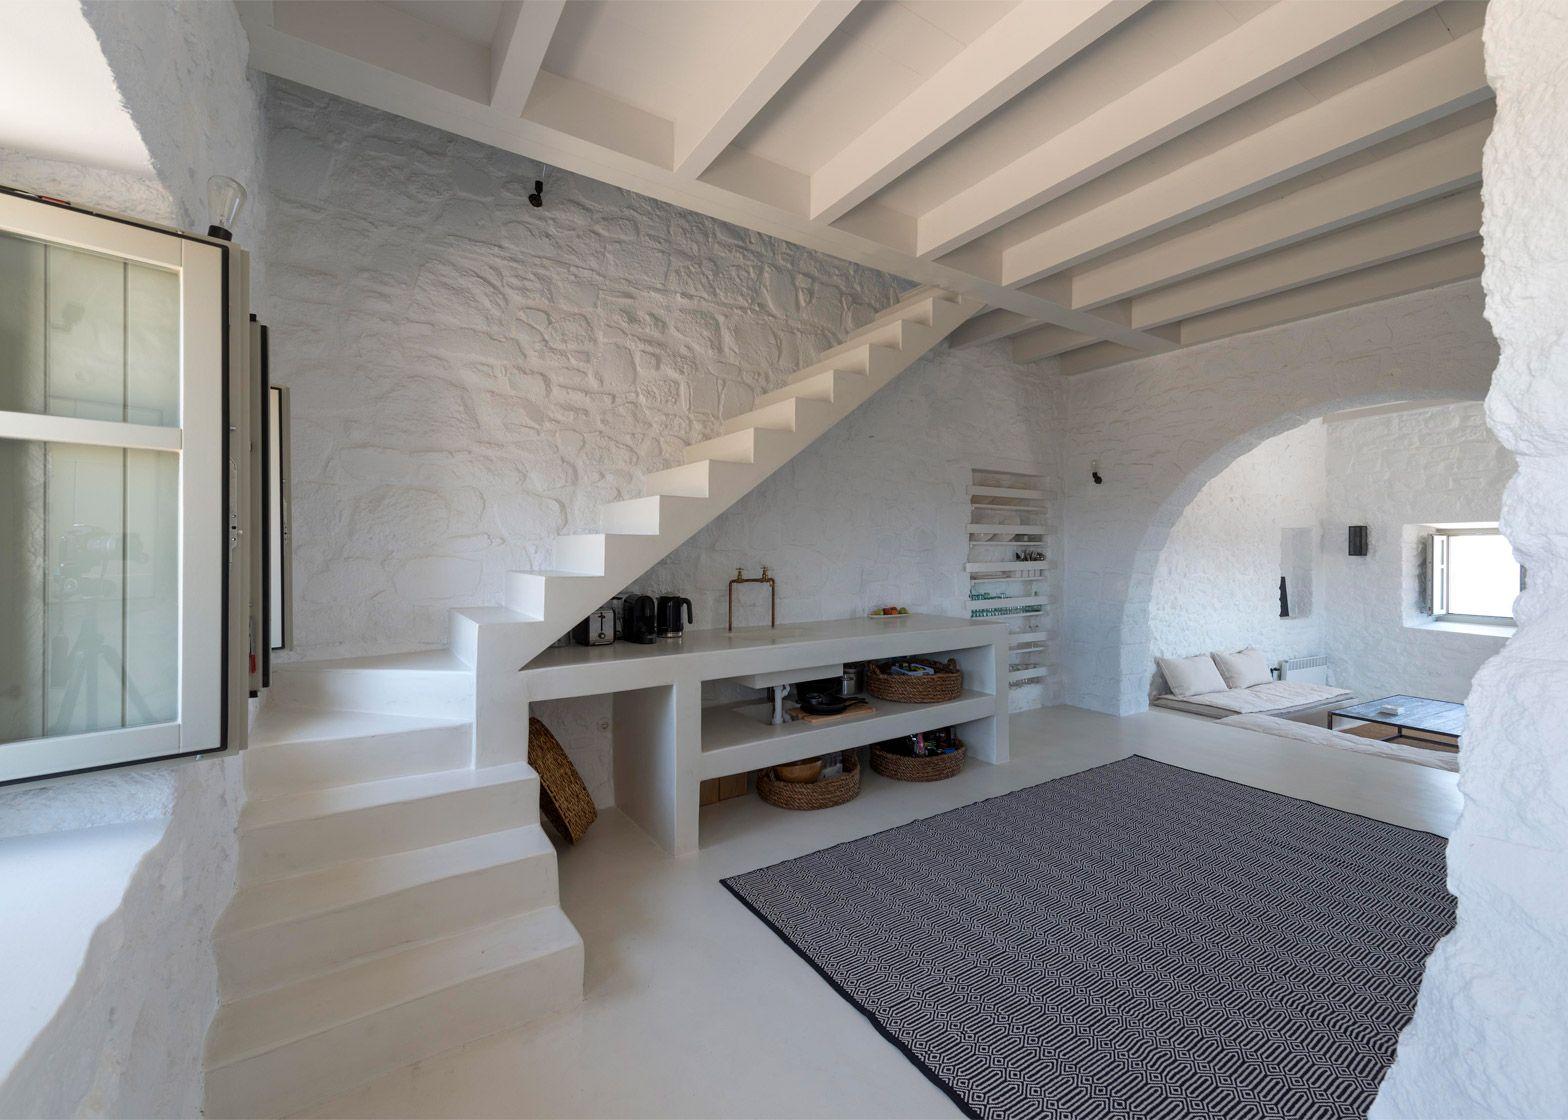 Dorf innenarchitektur greg haji joannides restores interior of greek island house